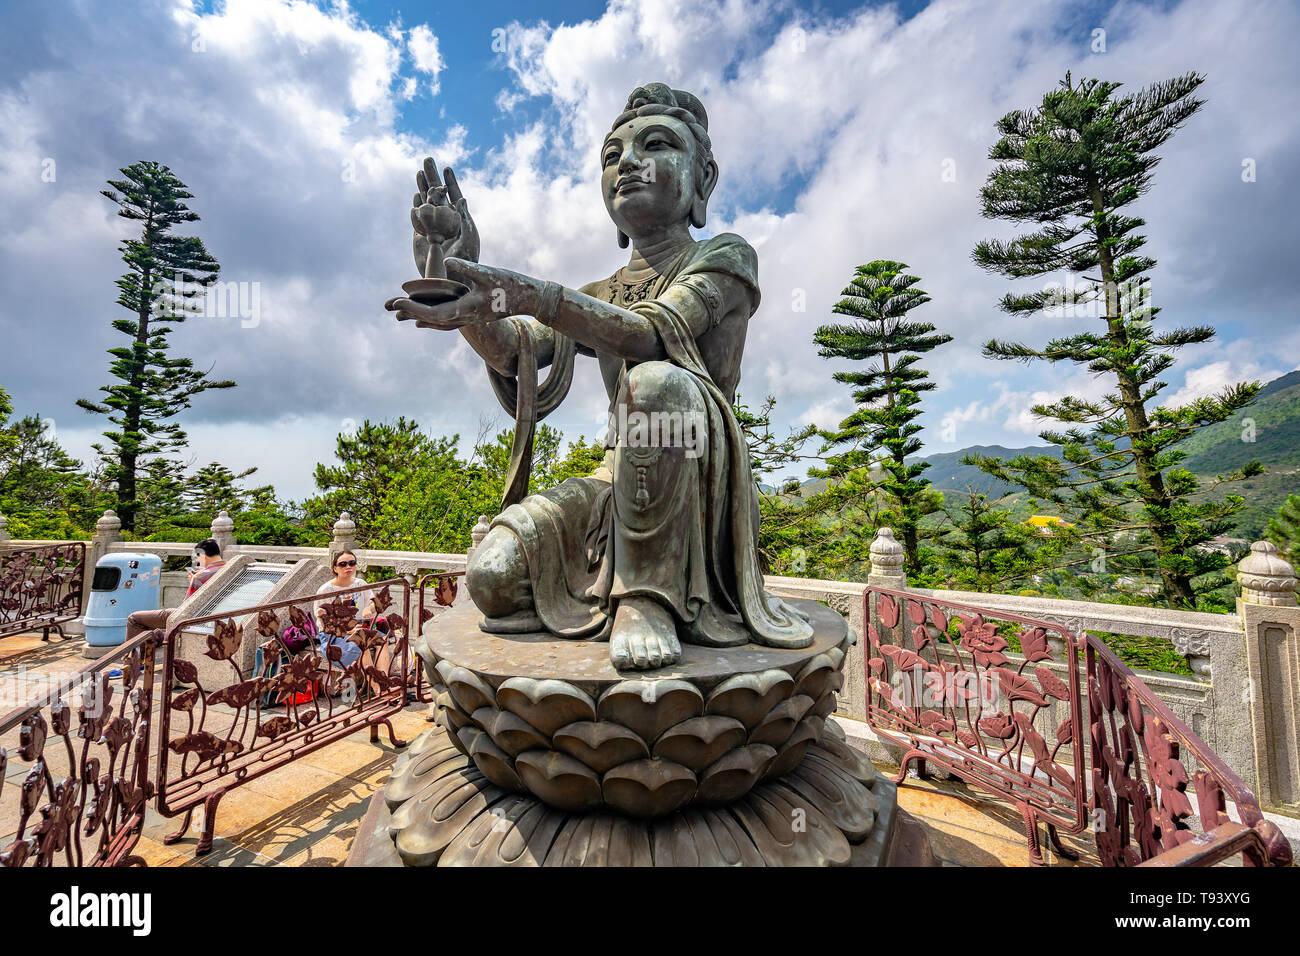 Hong Kong, China - Statues around the Big Buddha statue - Stock Image